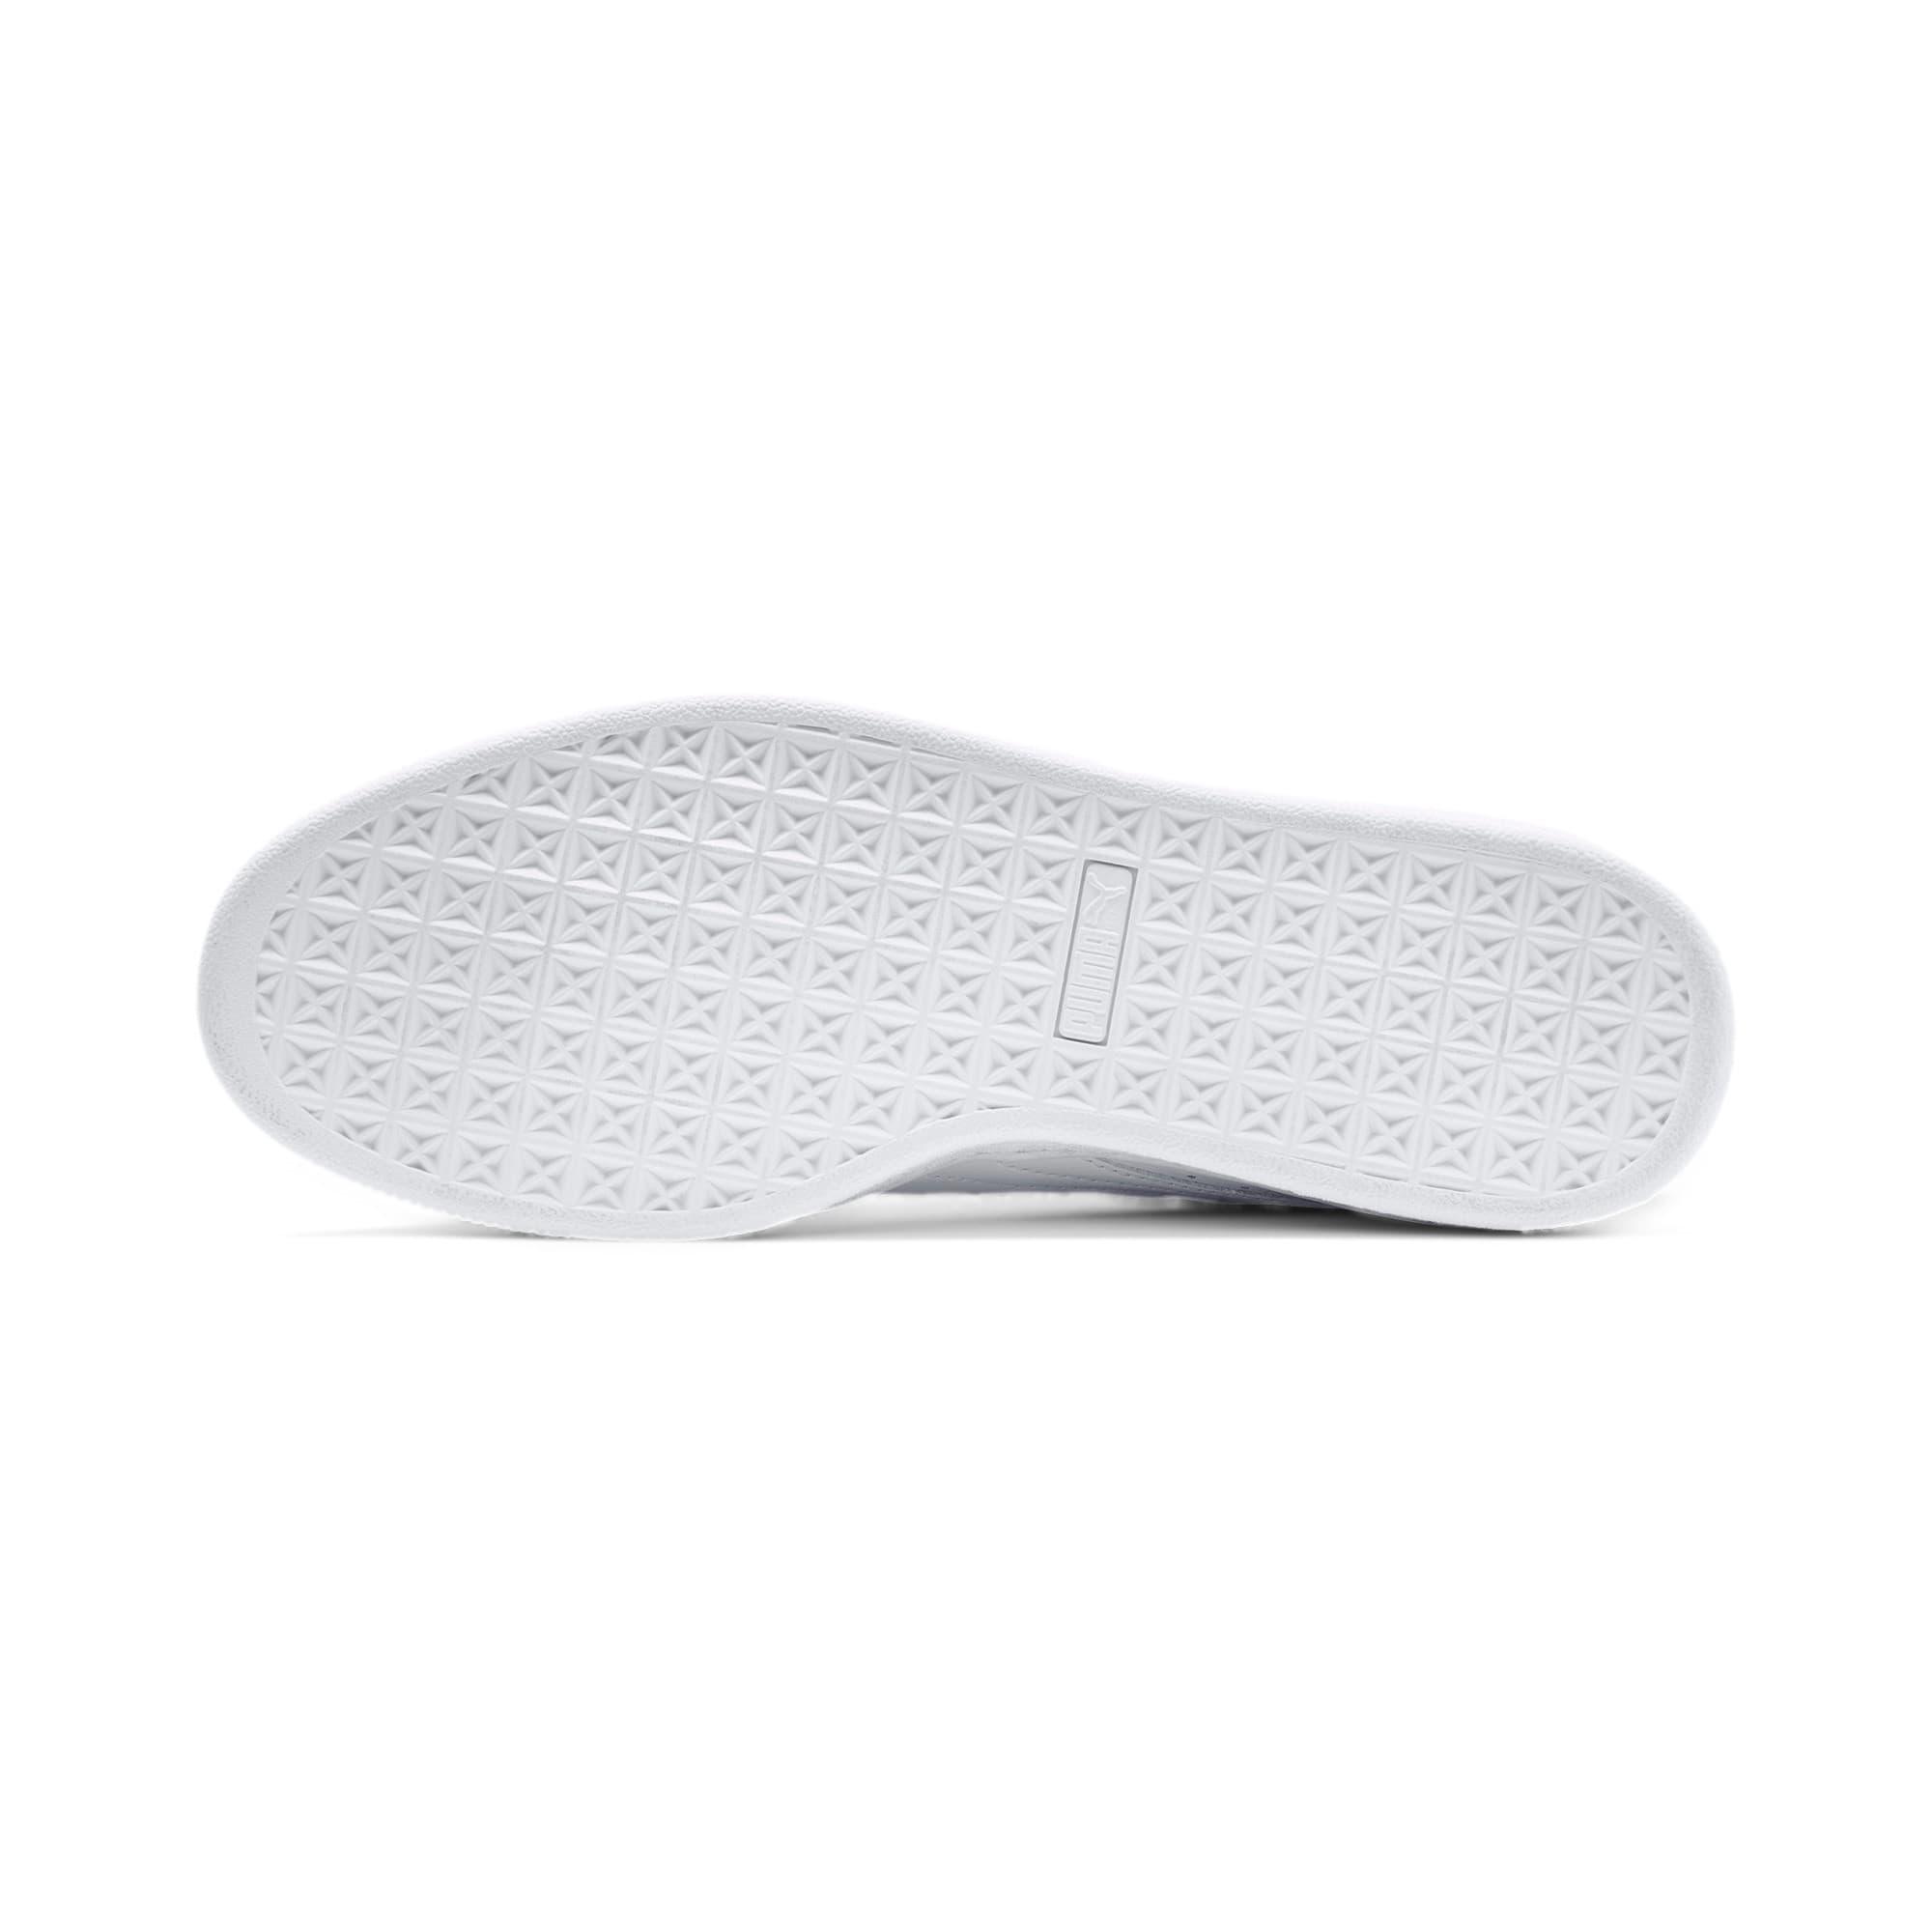 Thumbnail 4 of Basket Classic LFS schoenen voor heren, white-white, medium